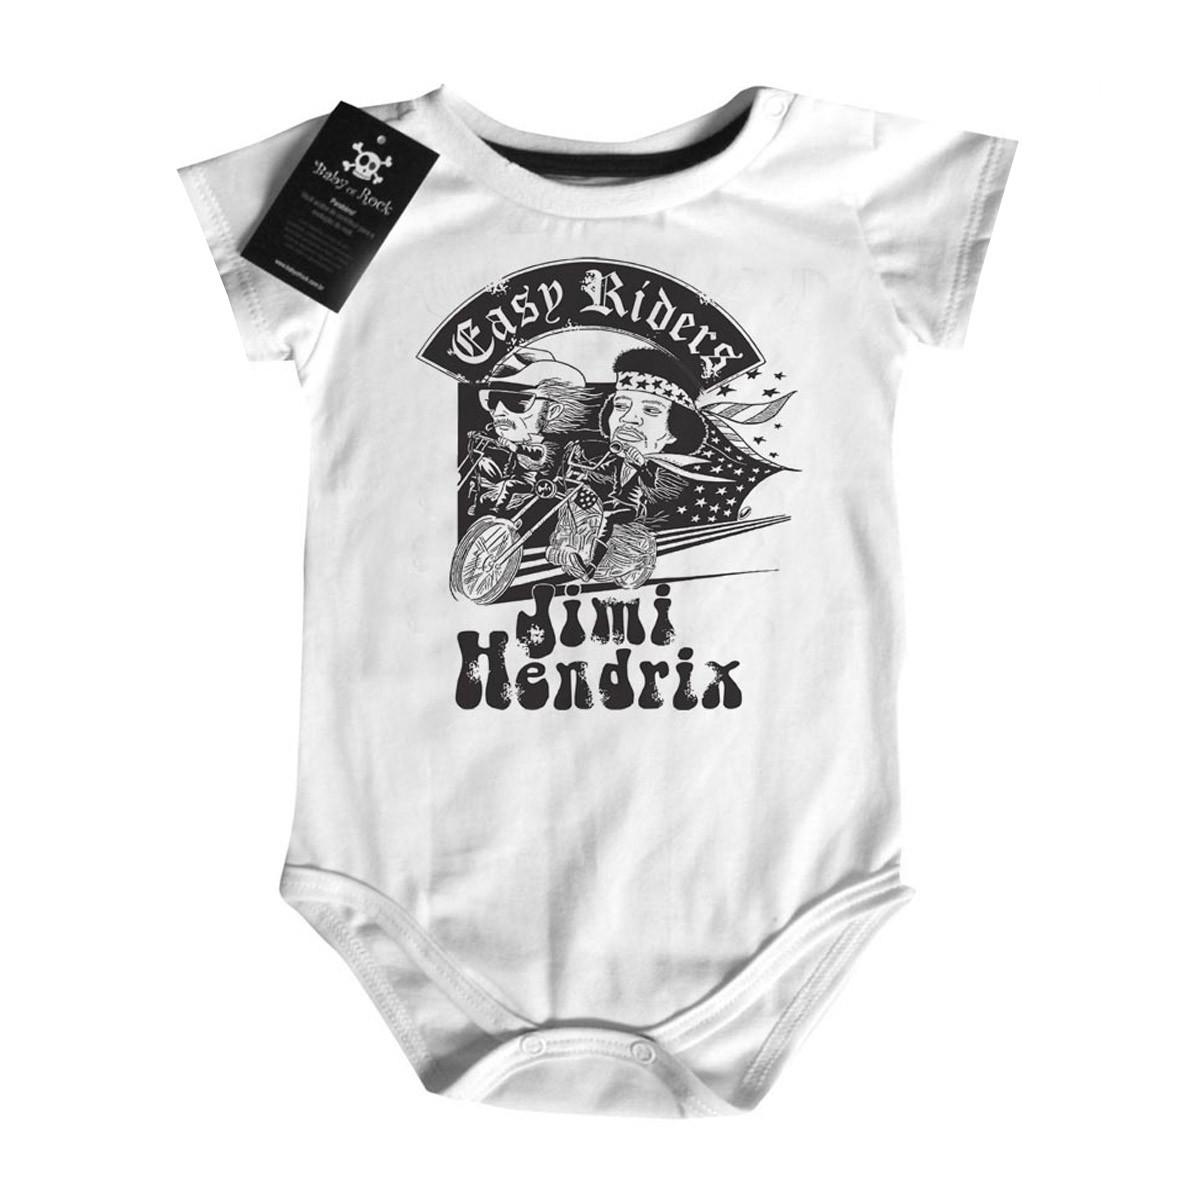 Body Rock Bebê Jimi Hendrix - Easy Riders - White  - Baby Monster - Body Bebe